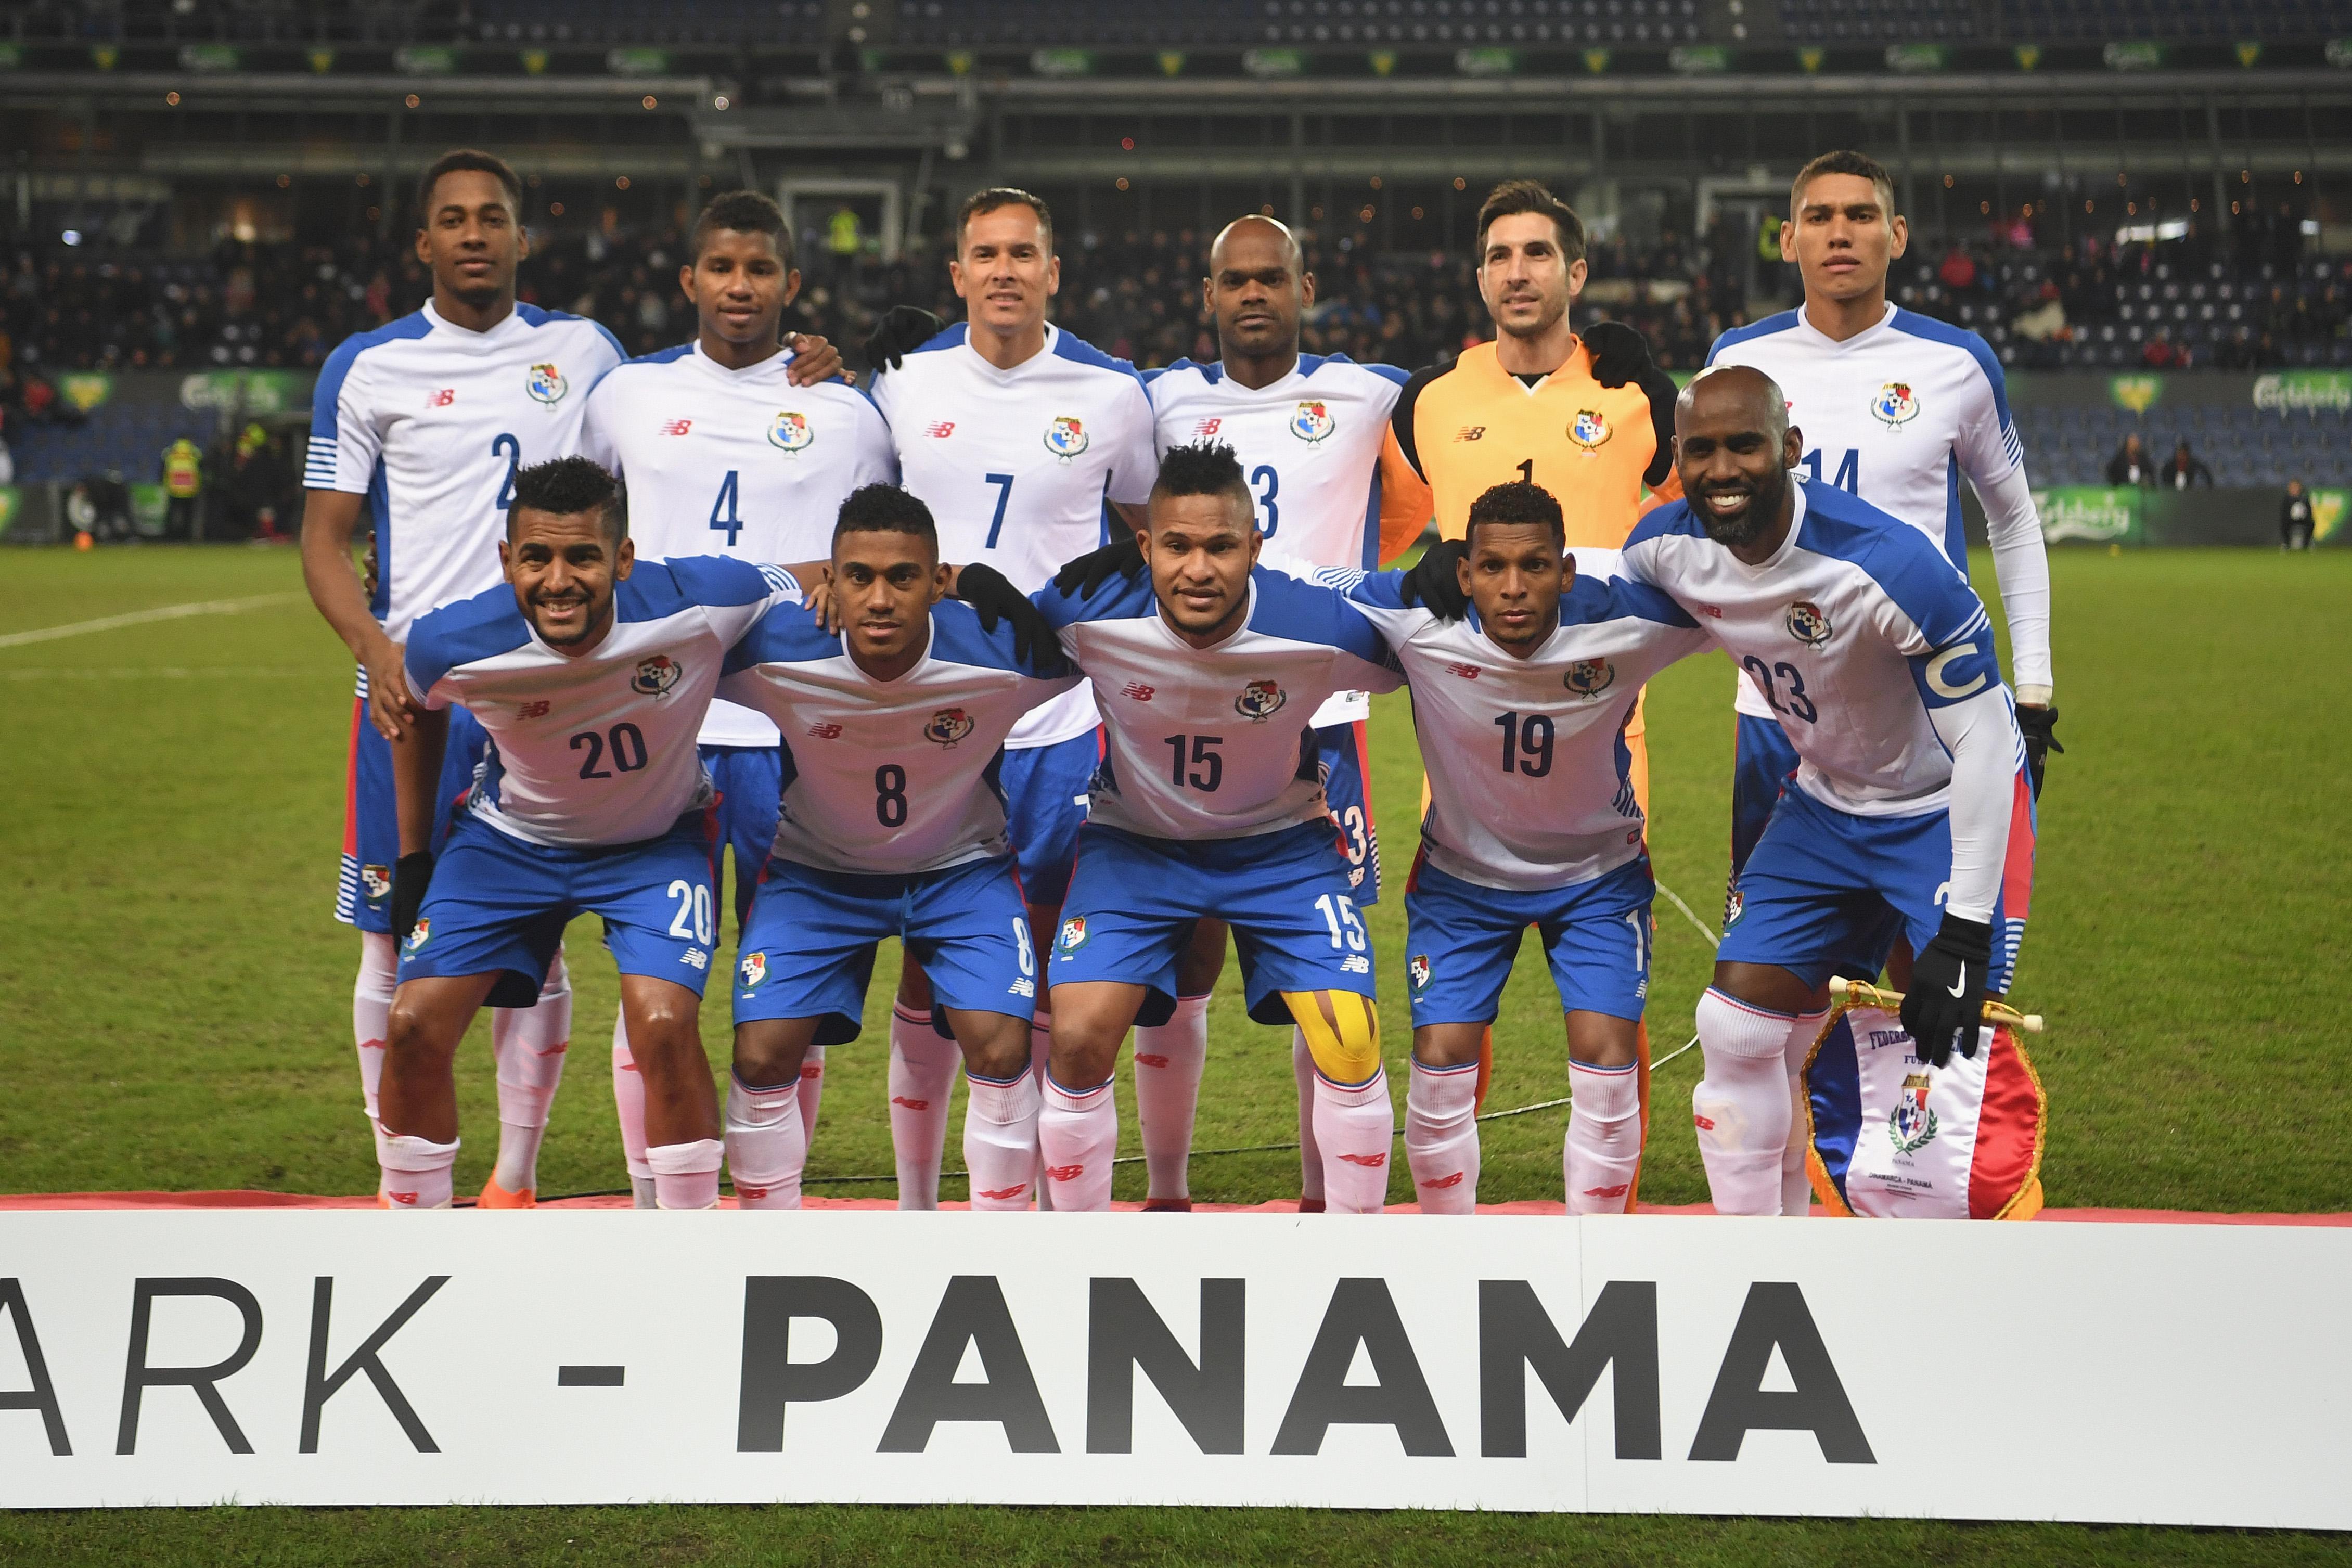 Прогноз на матч панама - гондурас